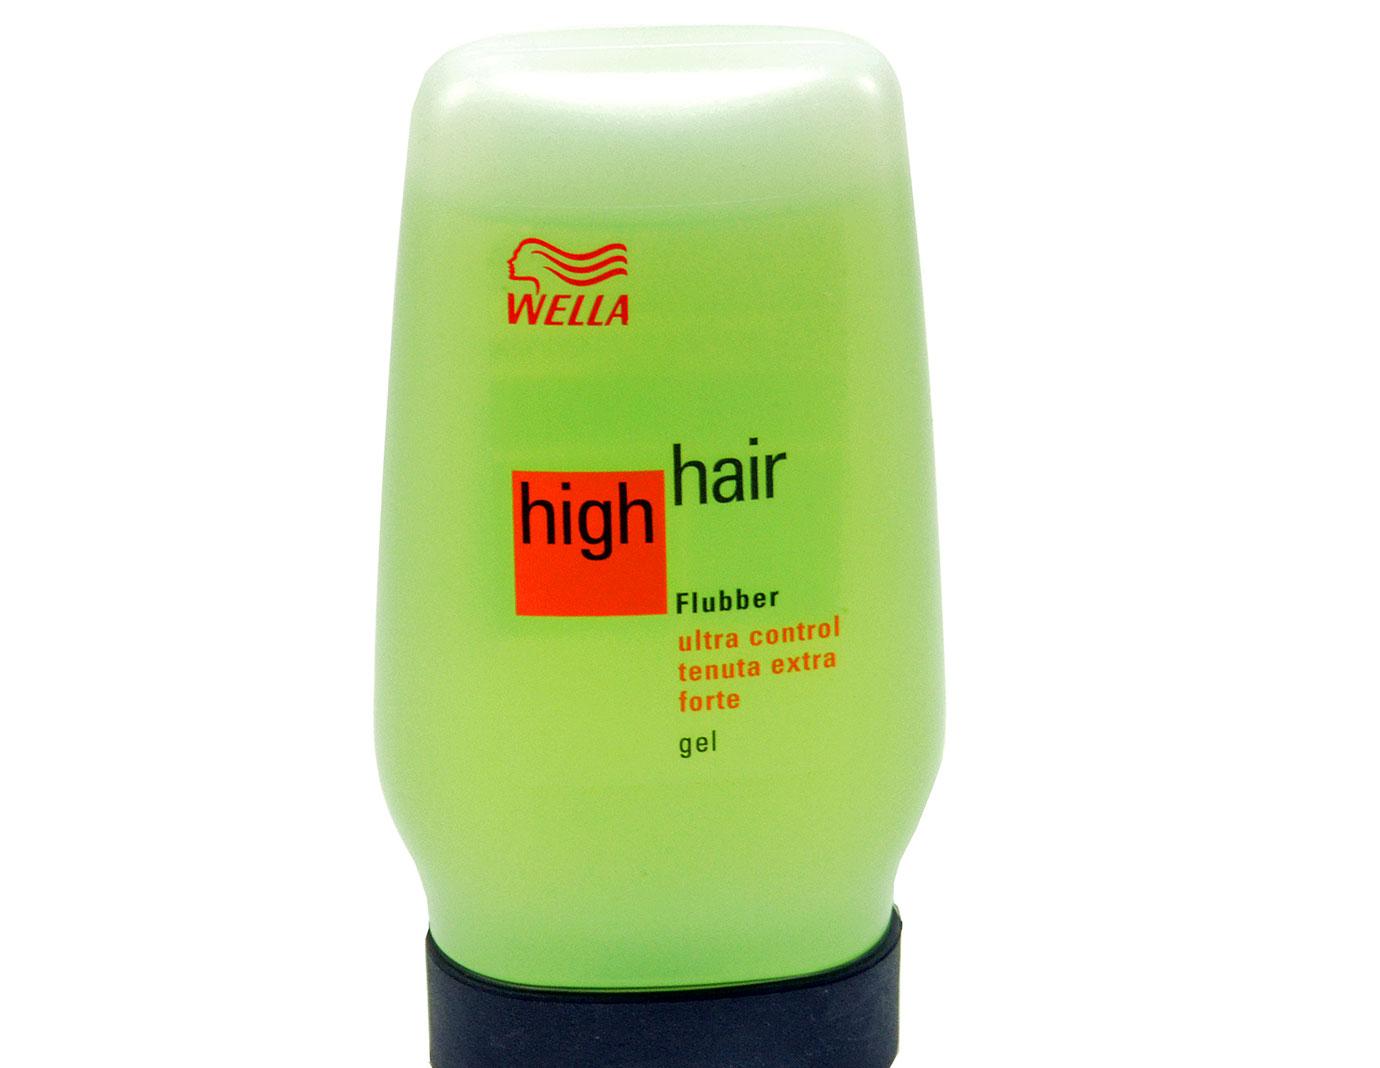 Wella High Hair Flubber Ultra Control Hair Gel (green Tube) - 125ml | eBay